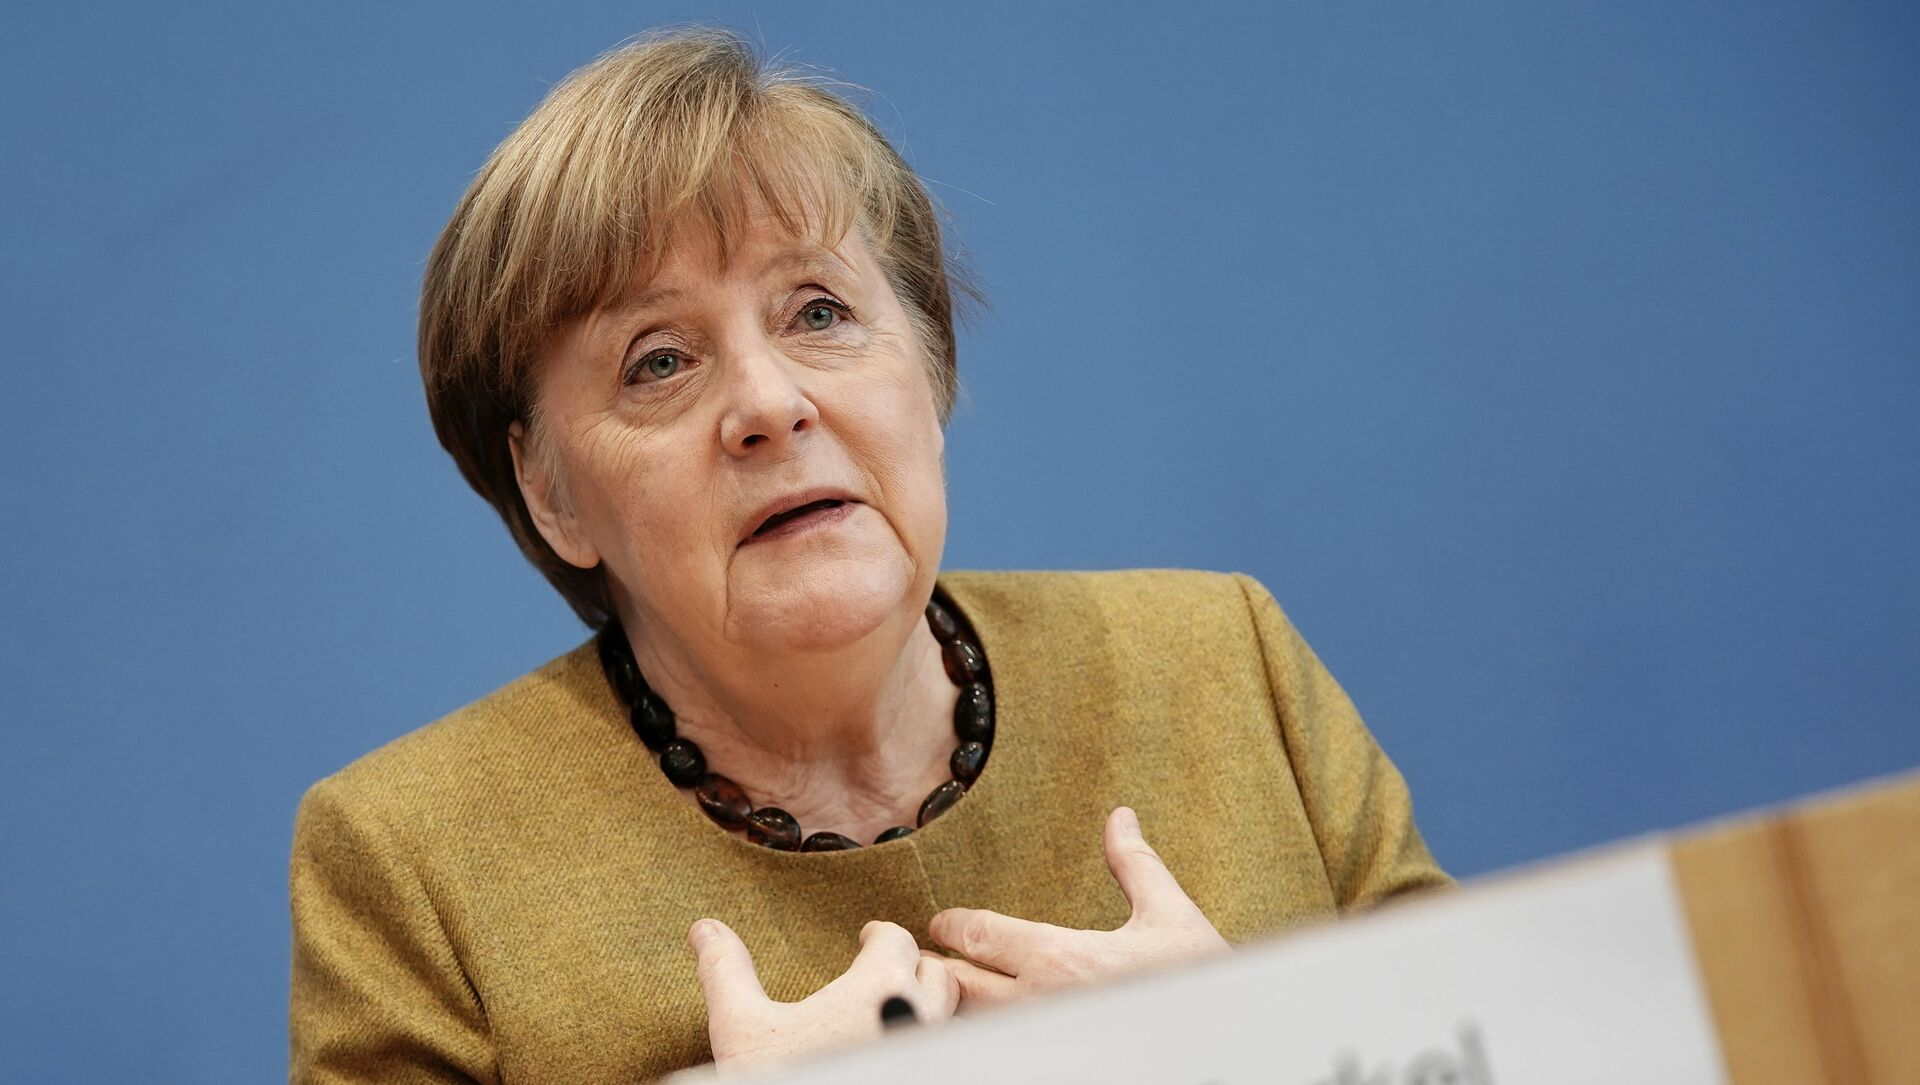 Angela Merkel, canciller alemana - Sputnik Mundo, 1920, 06.02.2021